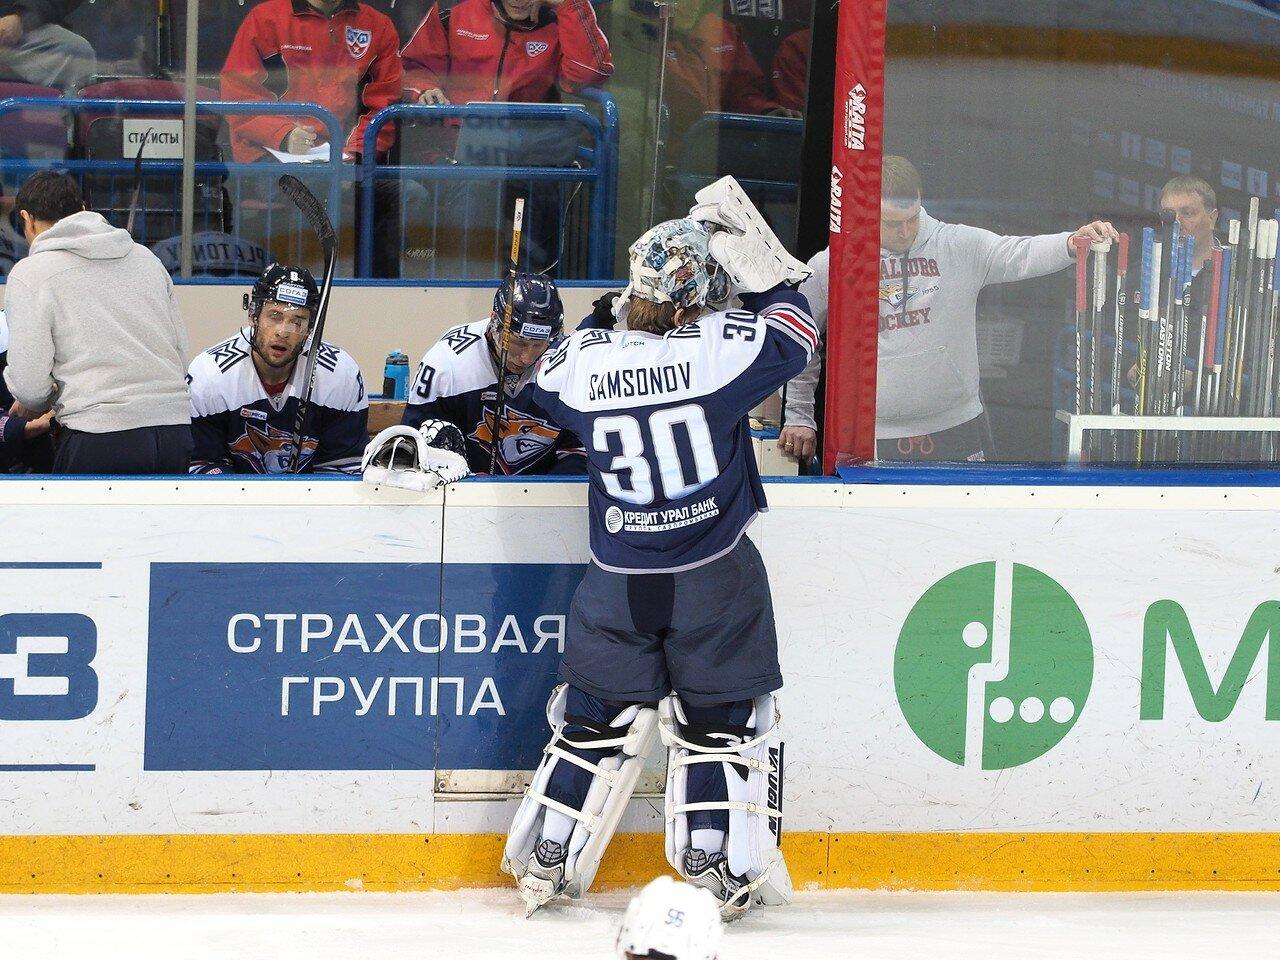 101Плей-офф 2016 Восток 1/2 Металлург - Сибирь 10.03.2016